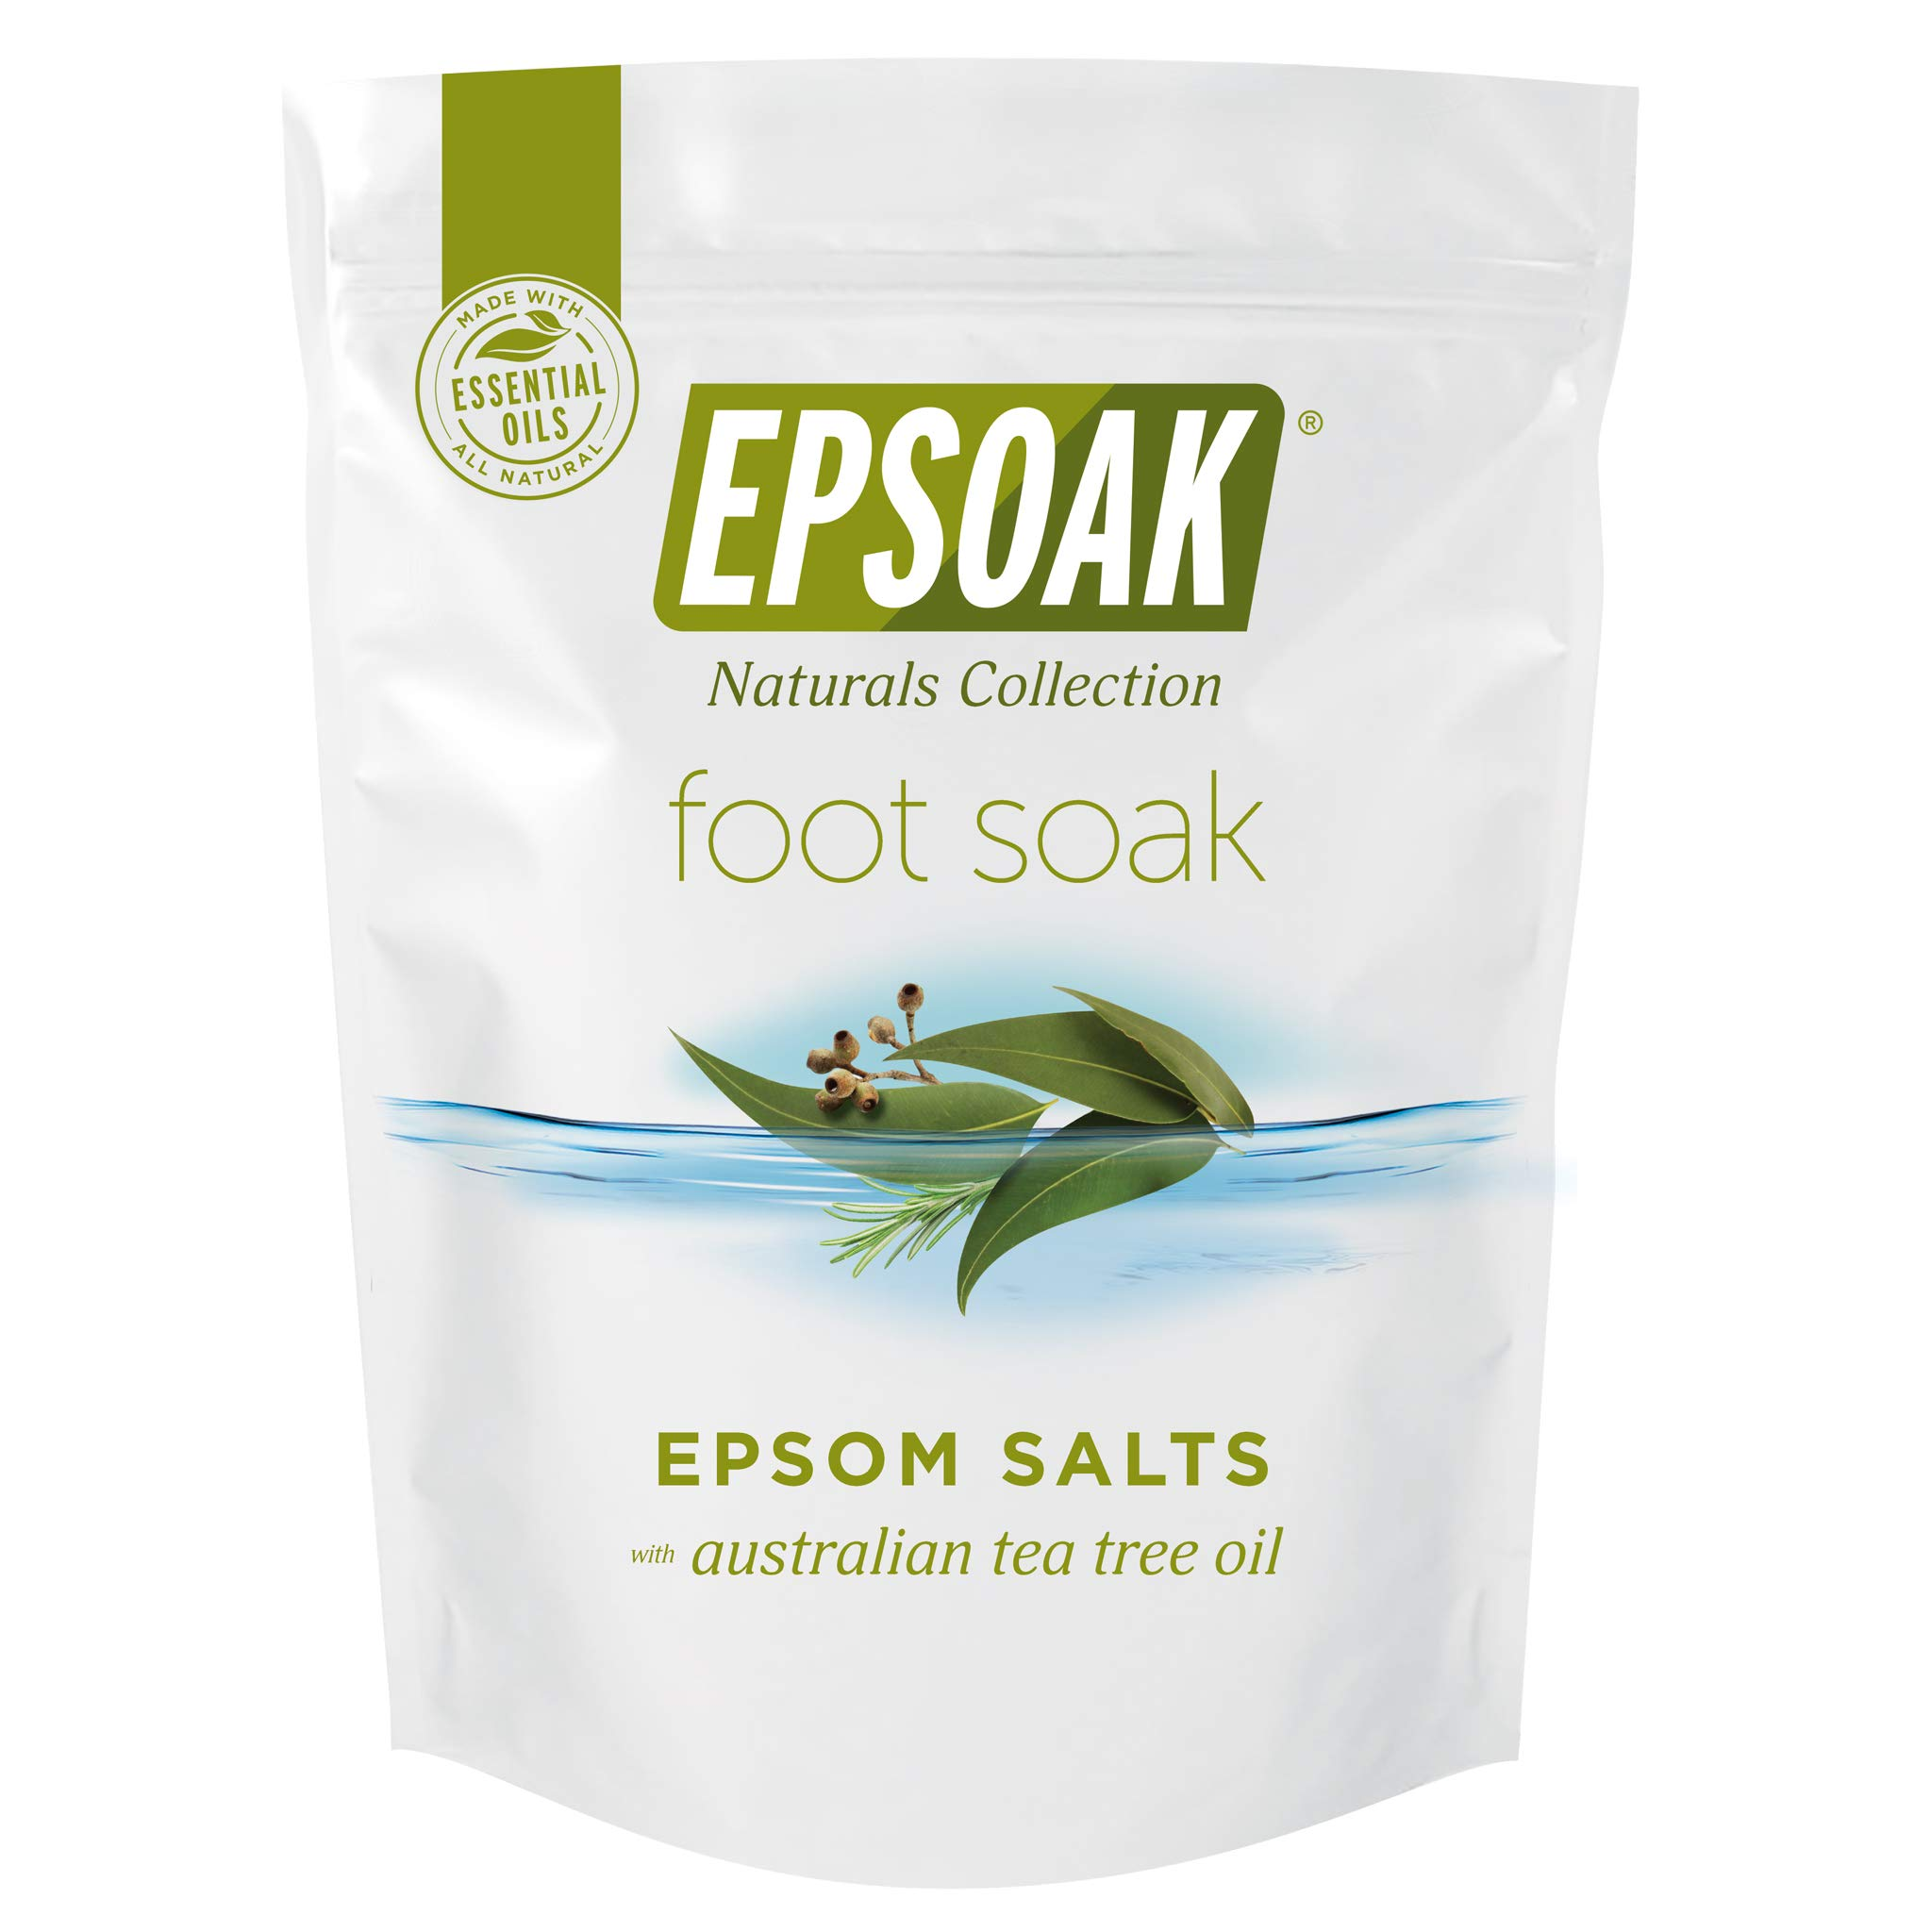 Tea Tree Oil Foot Soak with Epsoak Epsom Salt - 2 POUND Value Bag - Fight Bacteria, Nail Fungus, Athlete's Foot, and Unpleasant Foot Odor by Epsoak